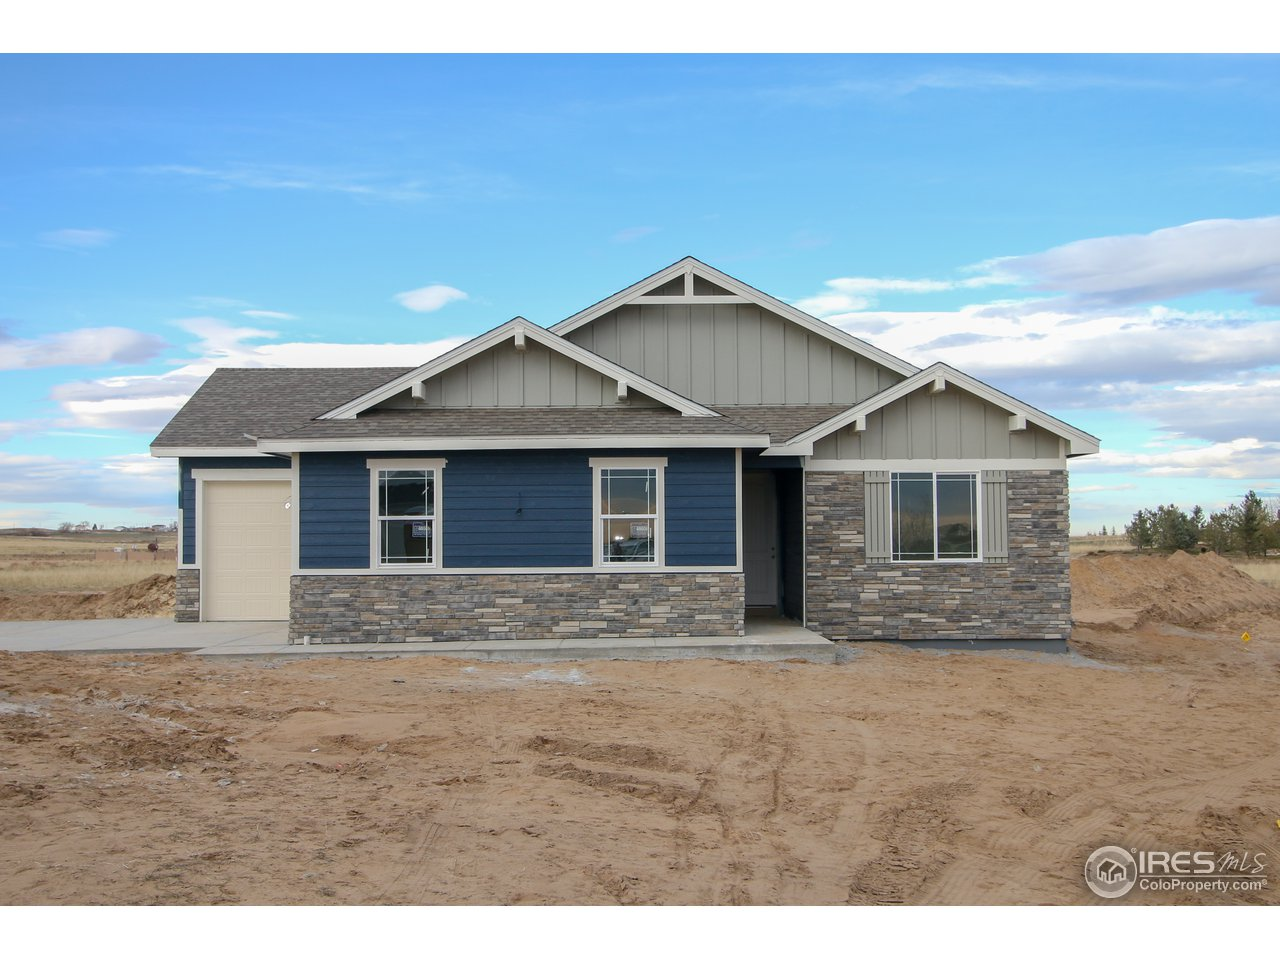 16508 Badminton Rd N 41, Platteville CO 80651